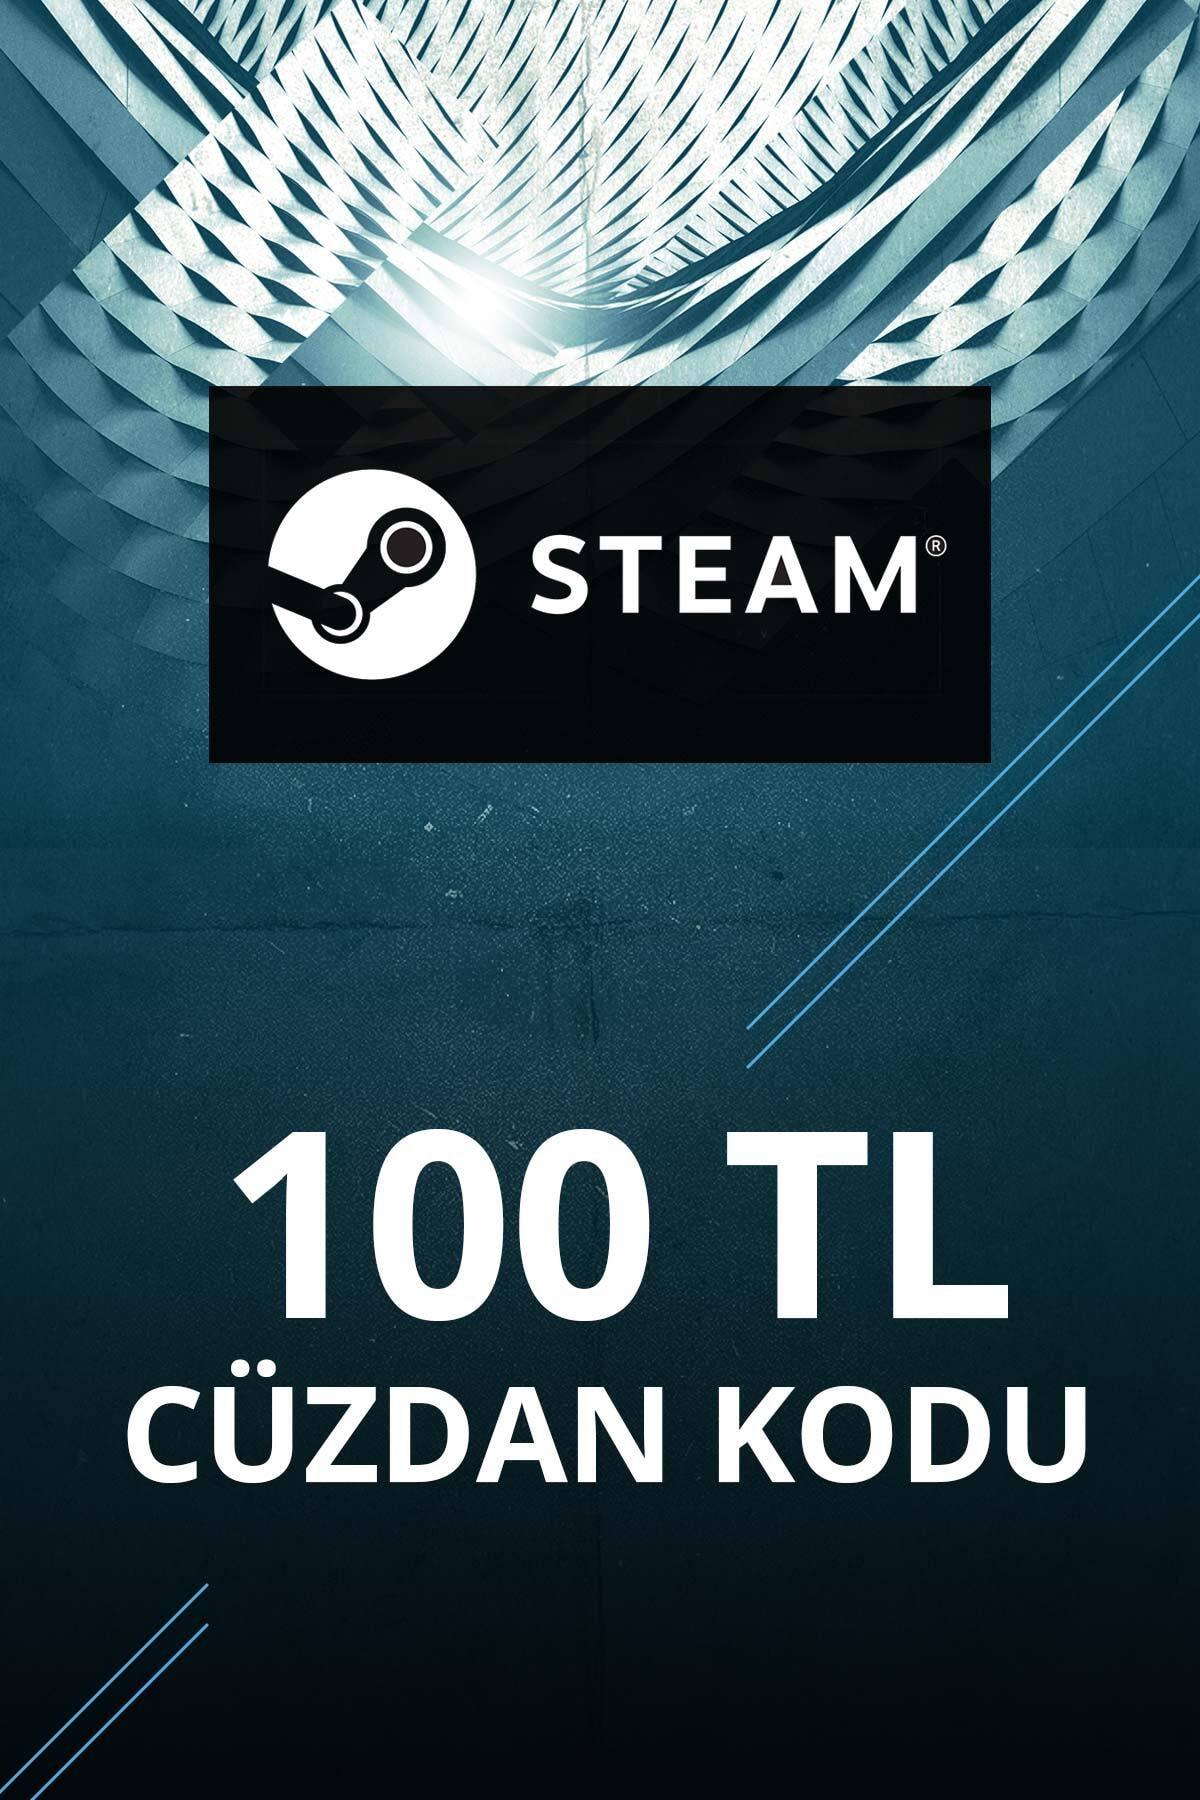 Steam 100 TL Cüzdan Kodu 0